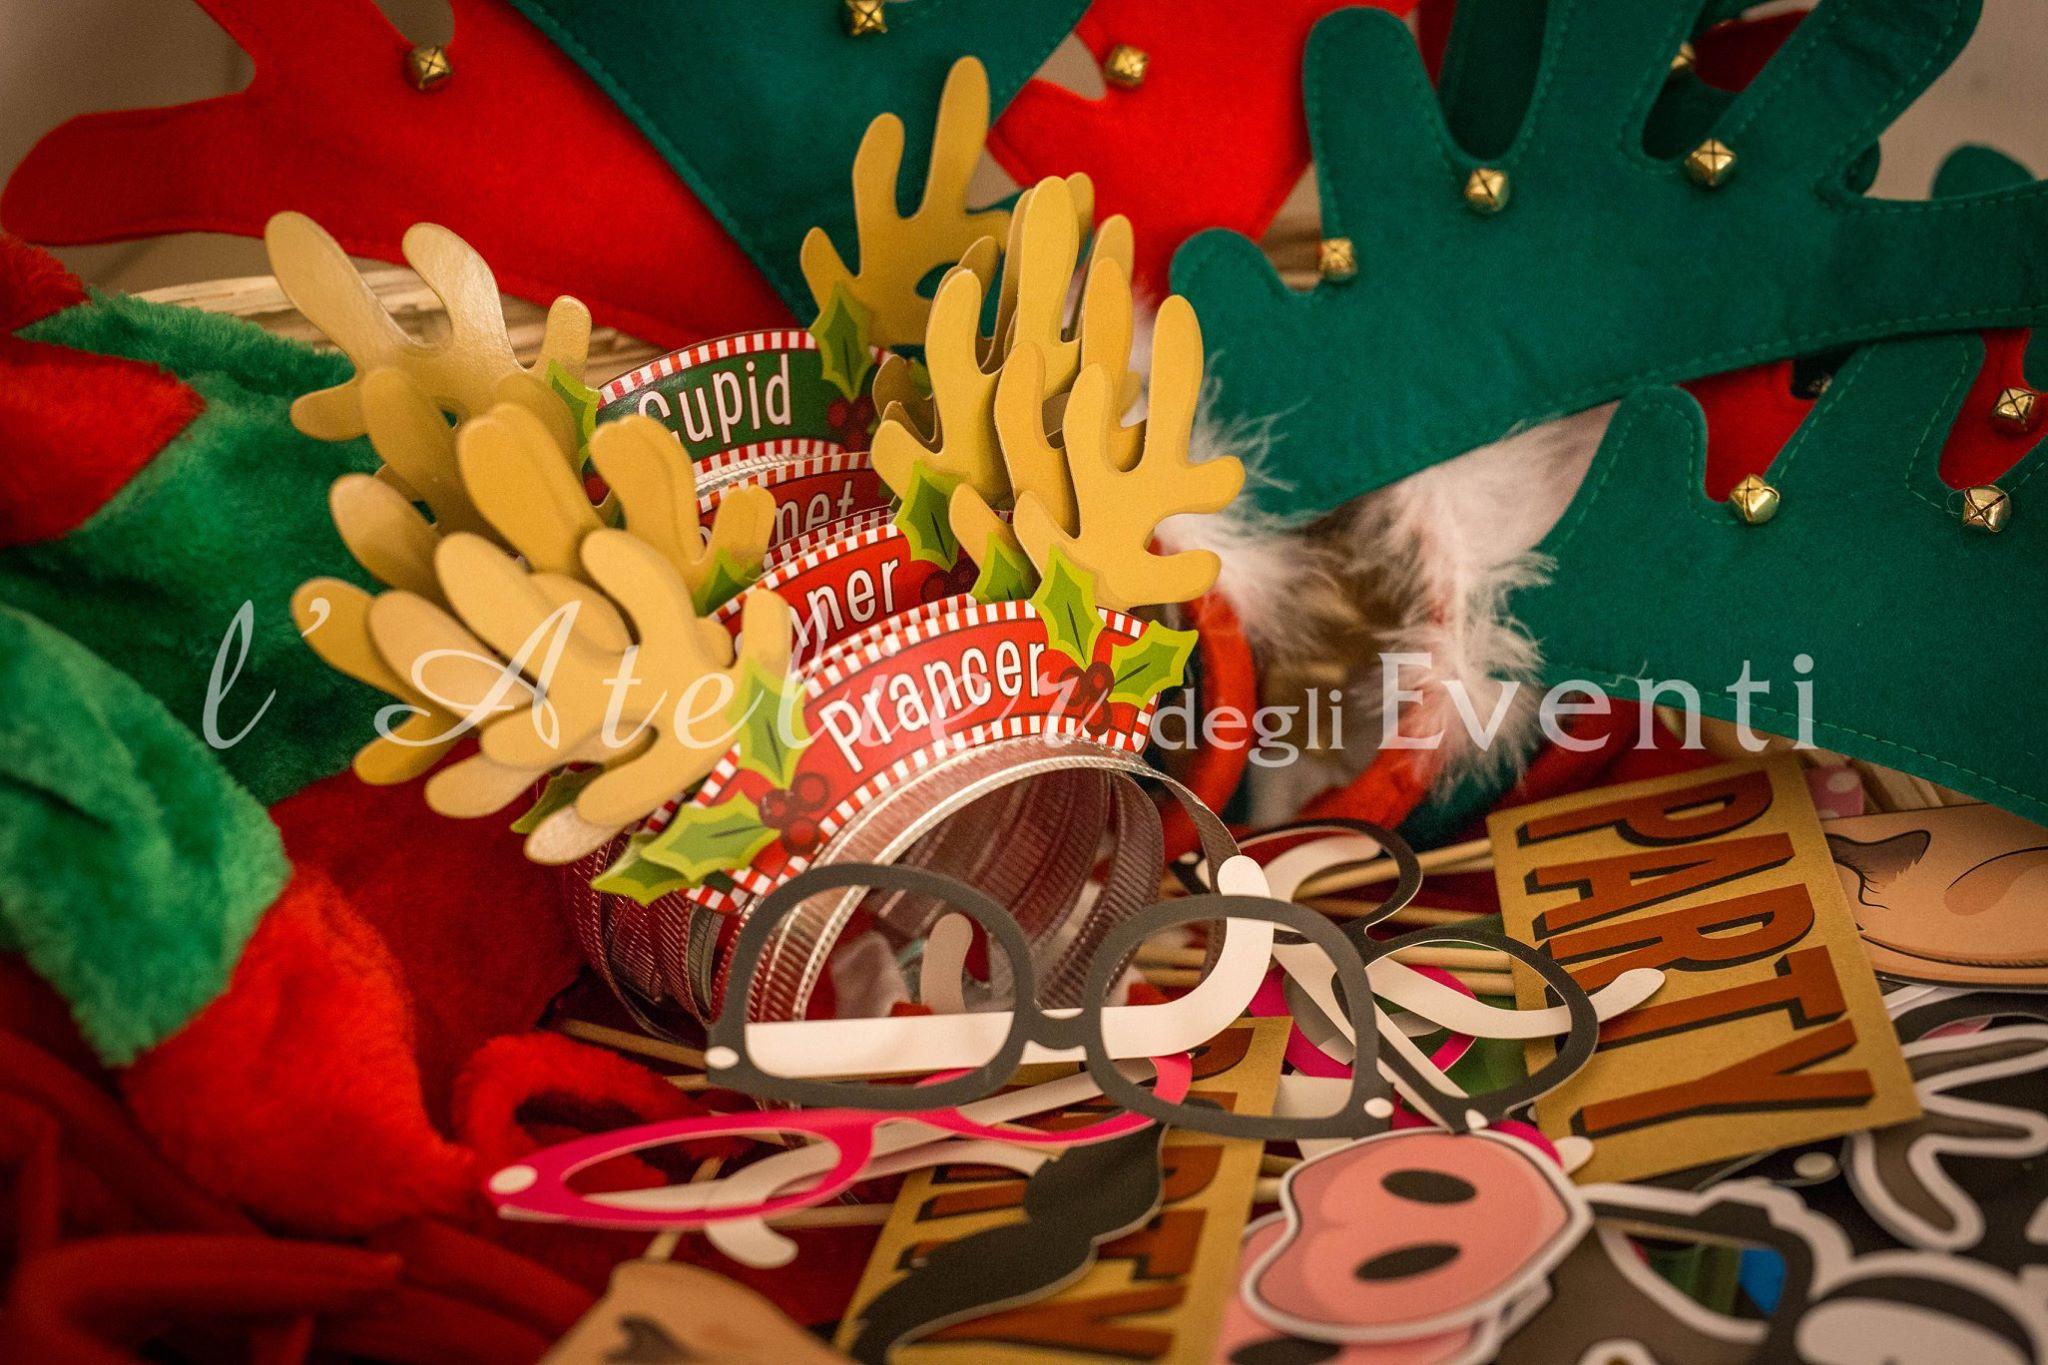 photoboot_fotografo_matrimonio_dettagli_angolo_selfie_natalizio